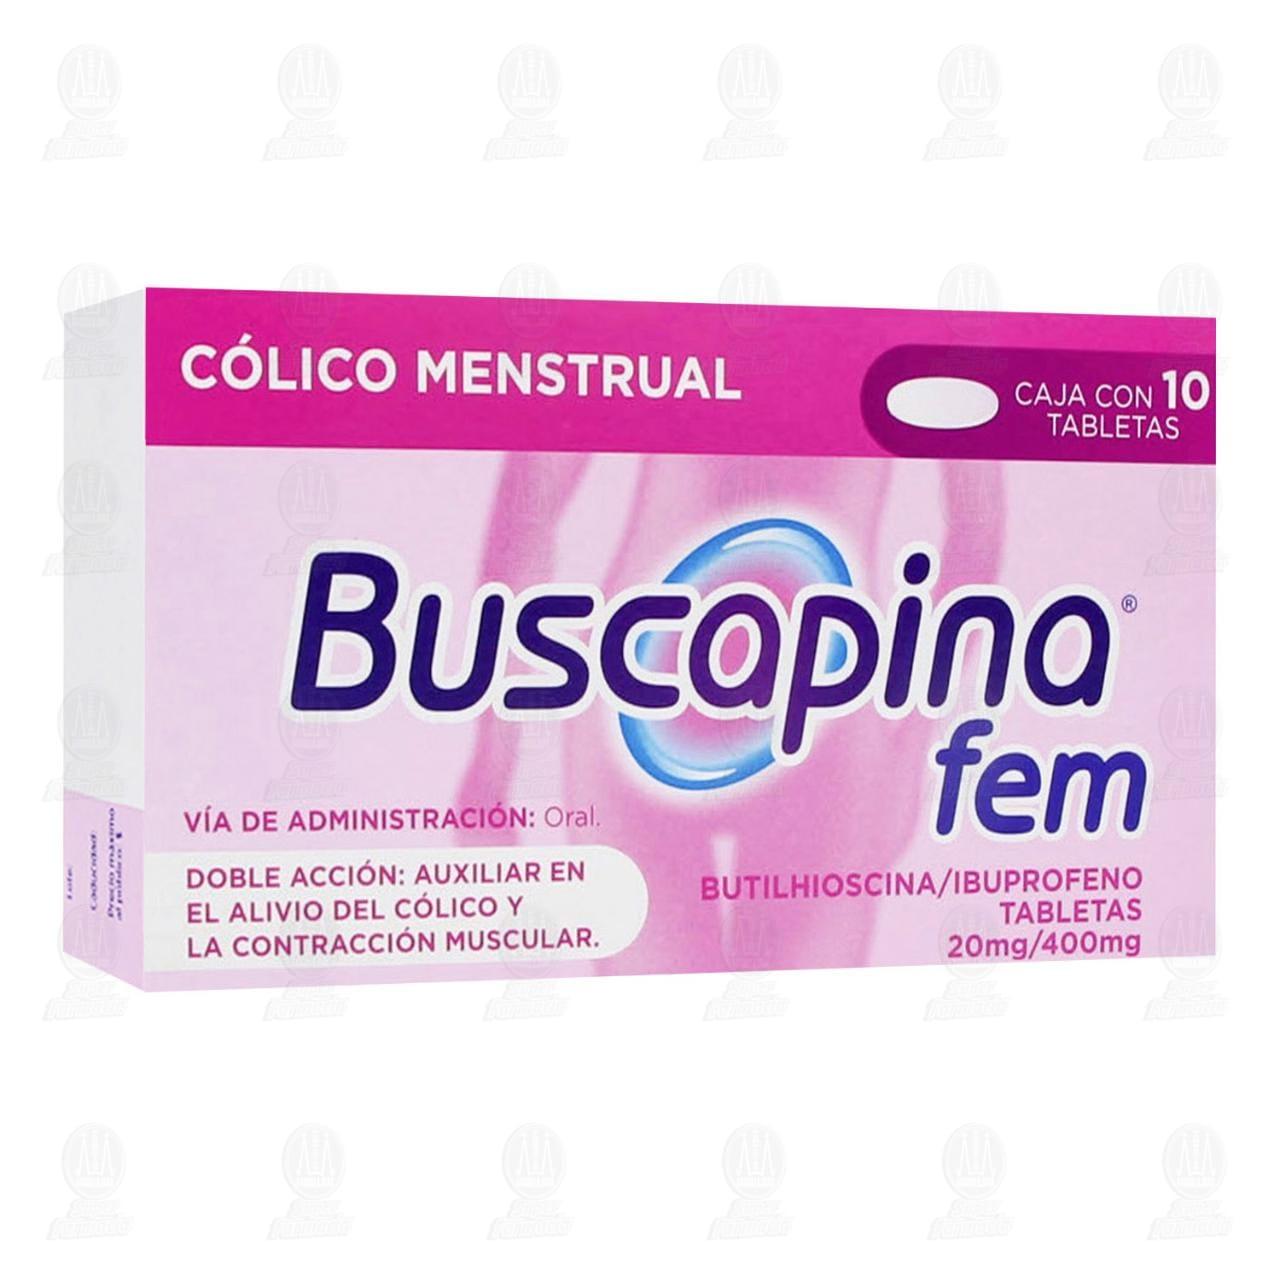 Comprar Buscapina Fem 20mg/400mg 10 Tabletas en Farmacias Guadalajara